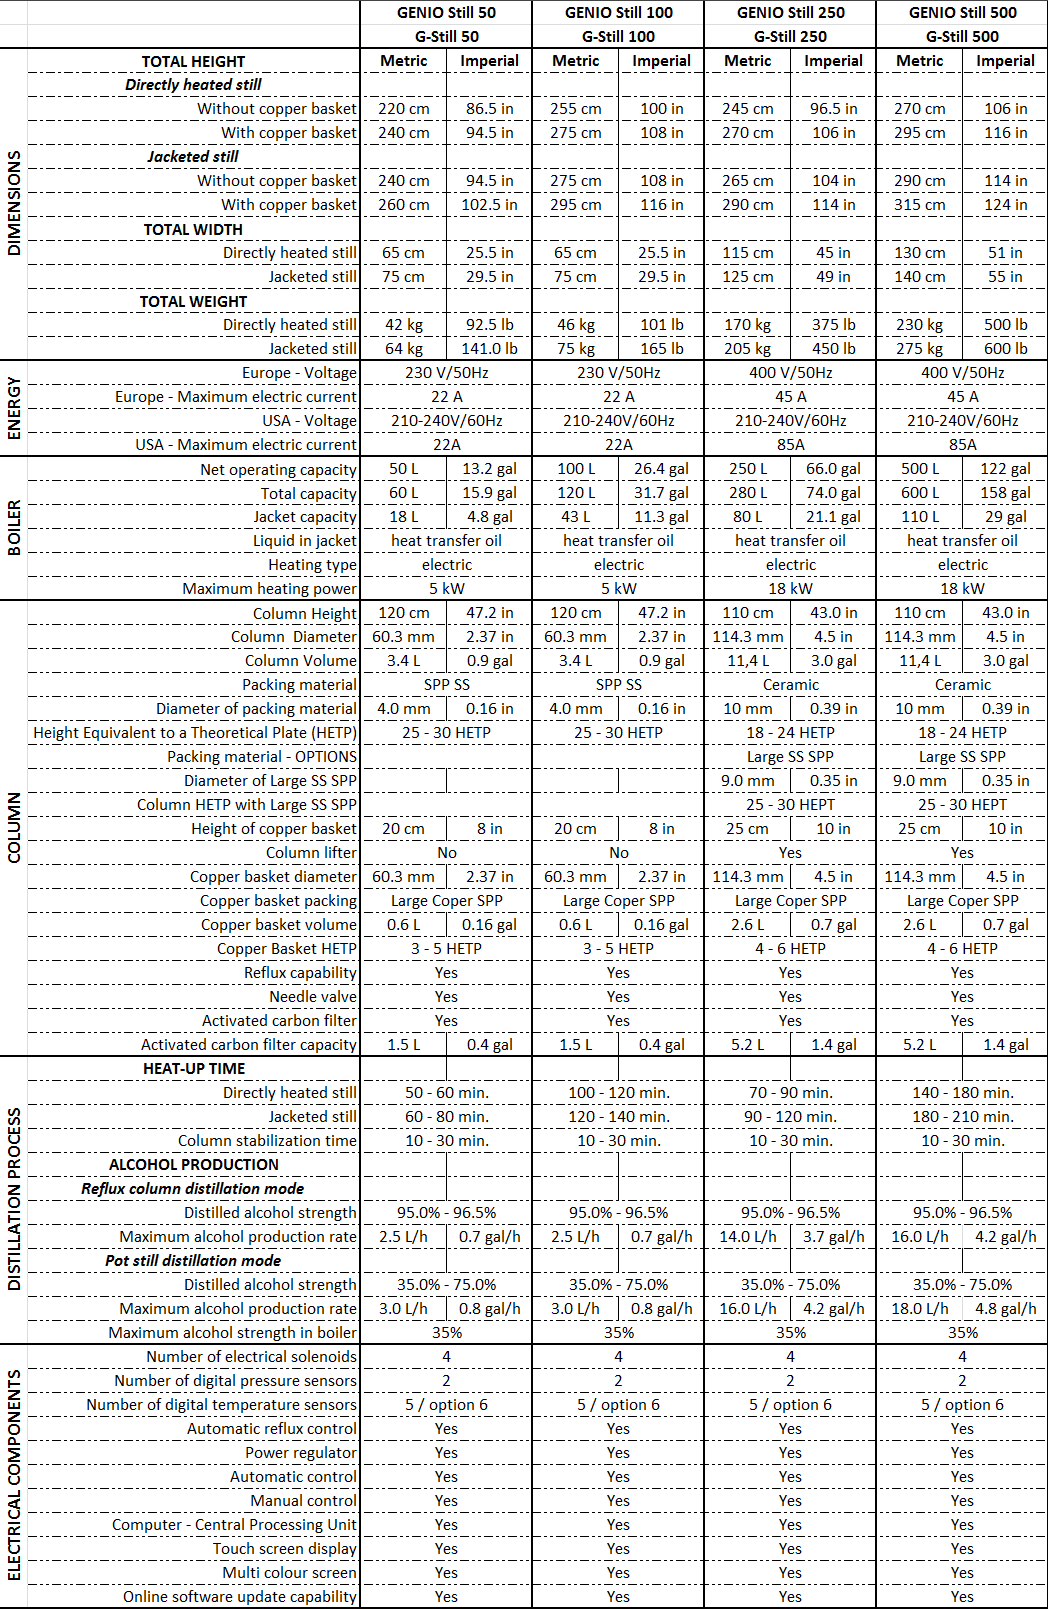 Genio Still Reflux Diagram Specifications Chart